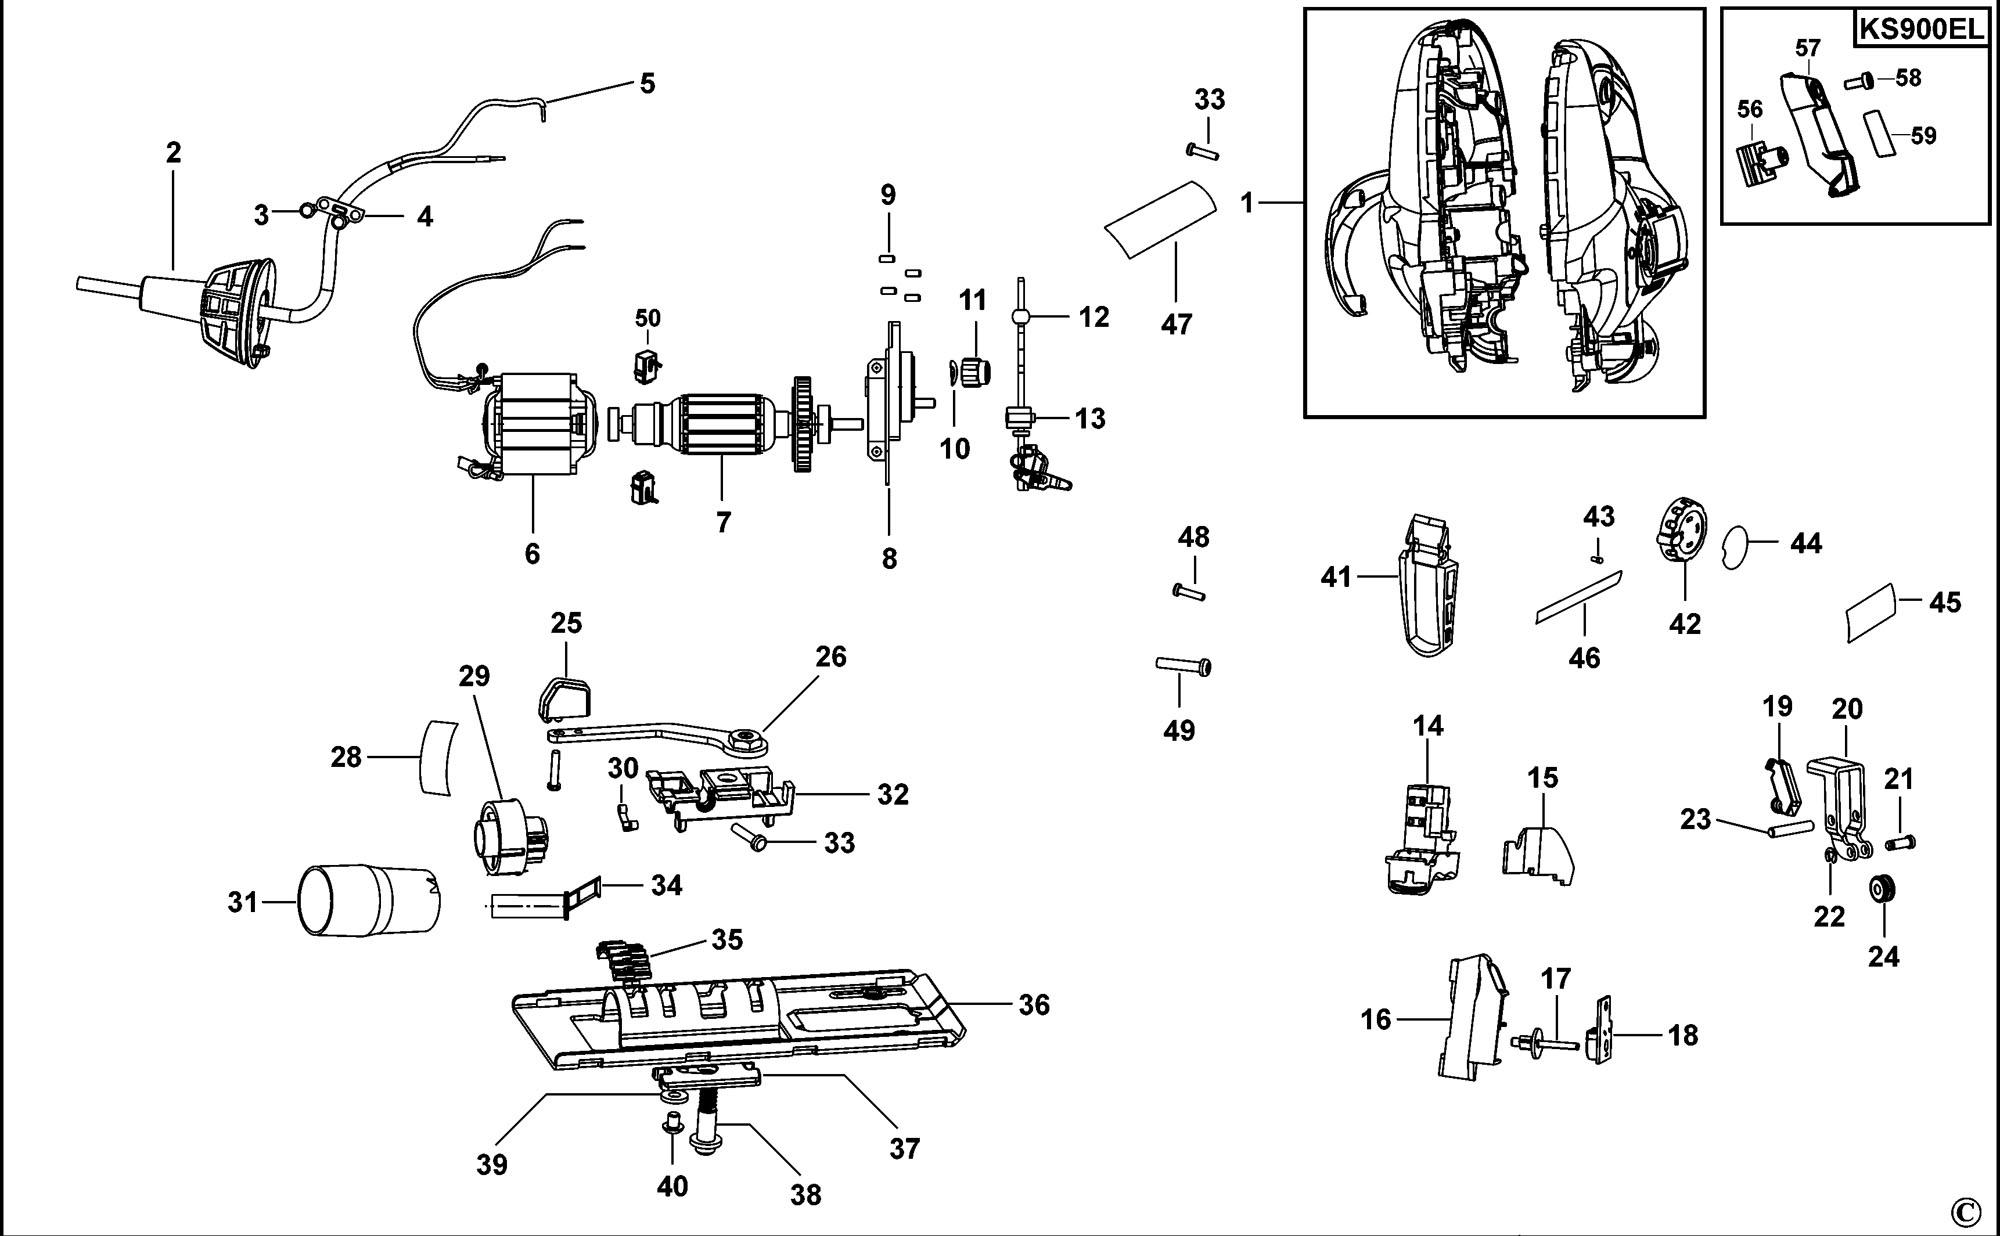 Spares For Black Amp Decker Ks900e K Jigsaw Type 1 Spare